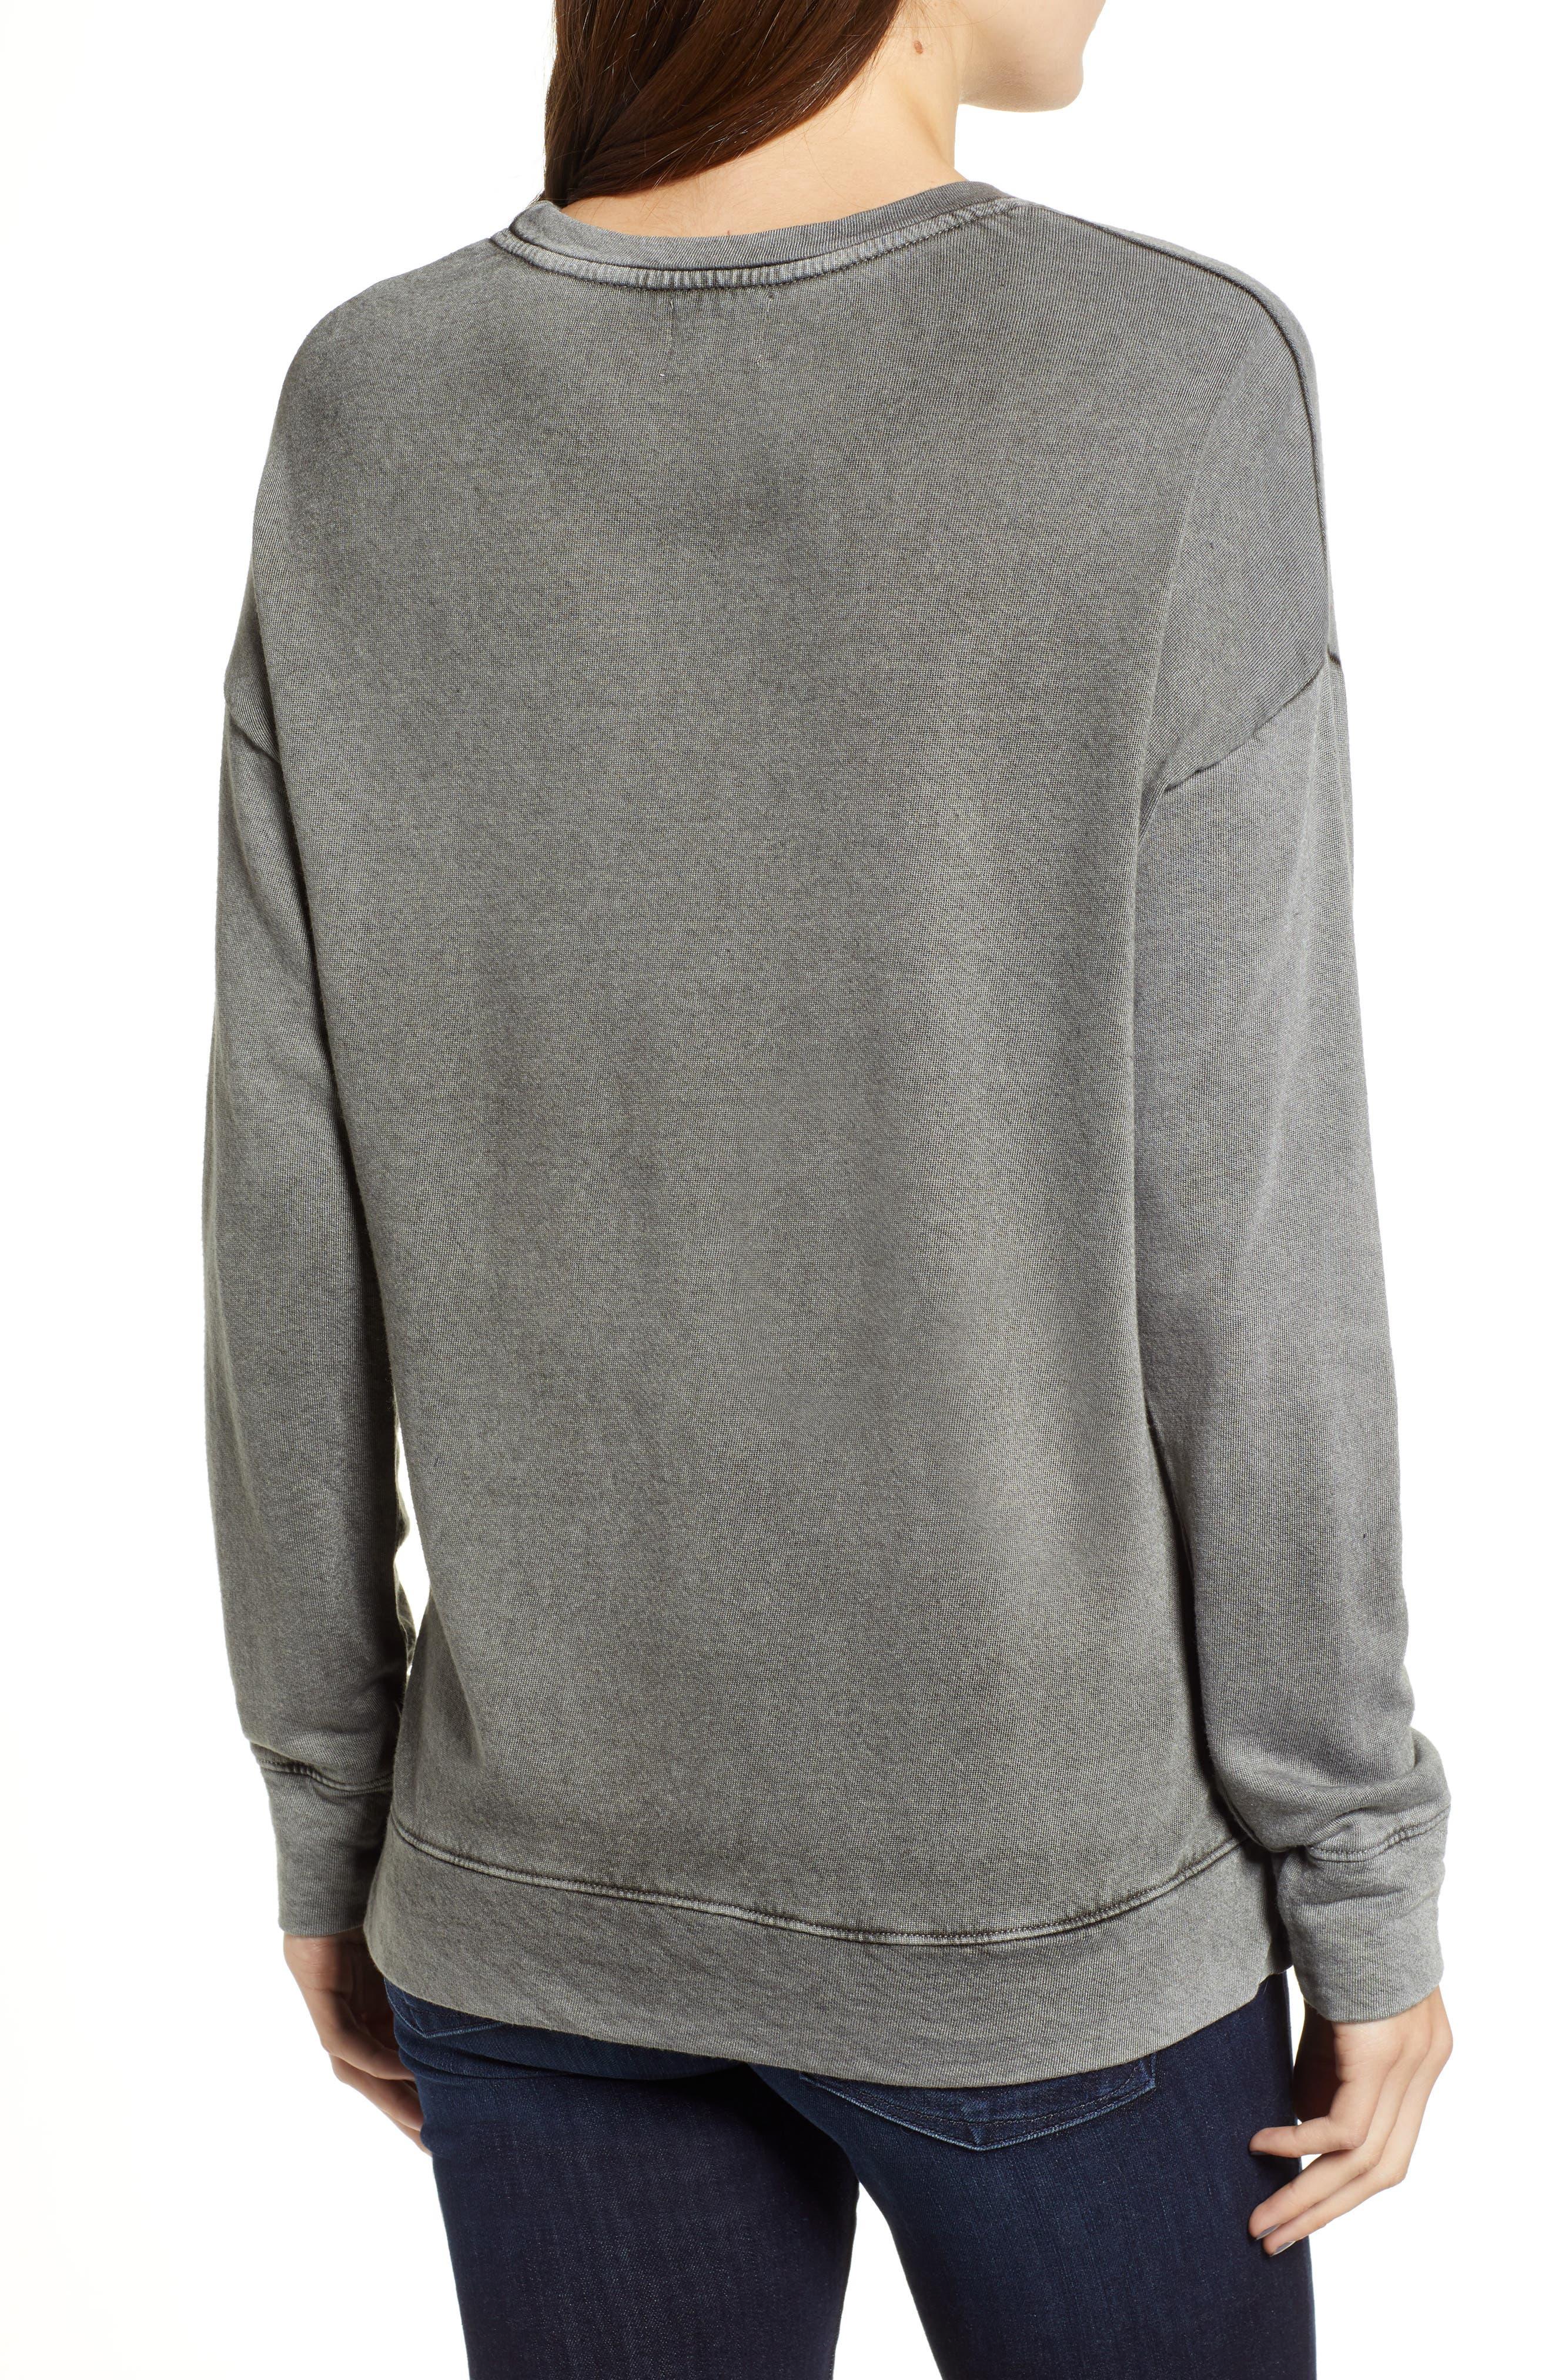 Honey Faded Sweatshirt,                             Alternate thumbnail 2, color,                             300